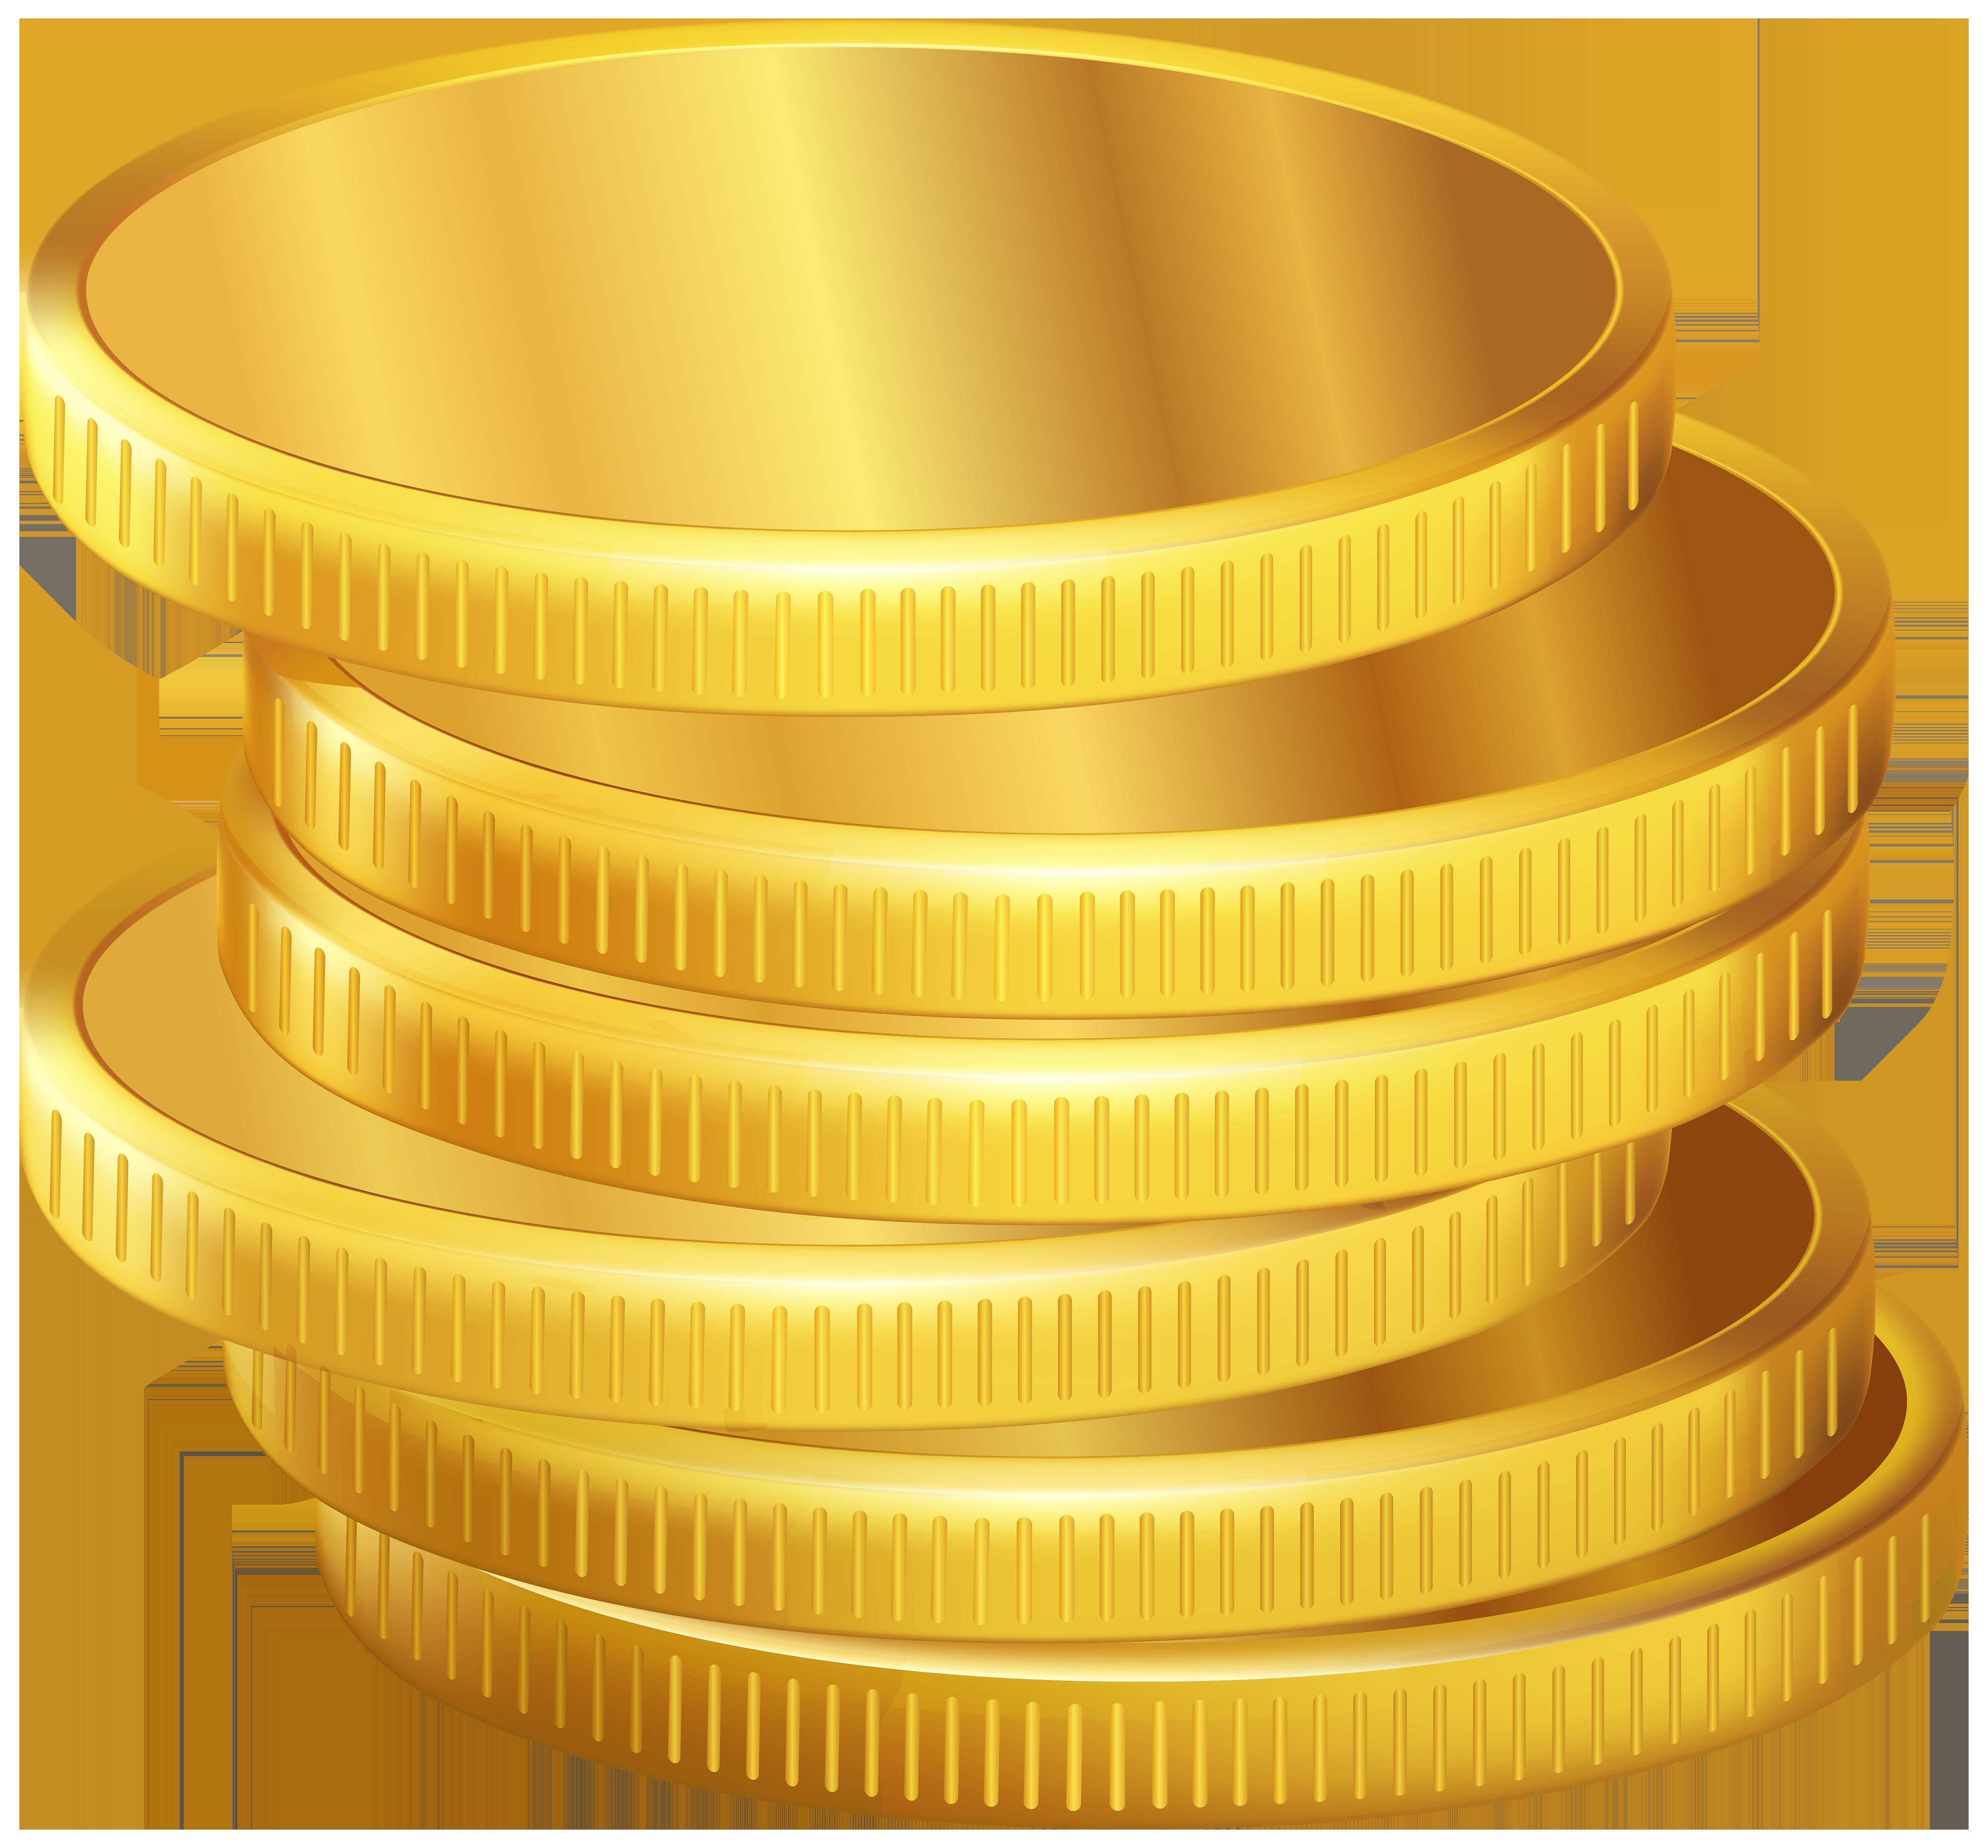 Coins clipart. Golden png best web